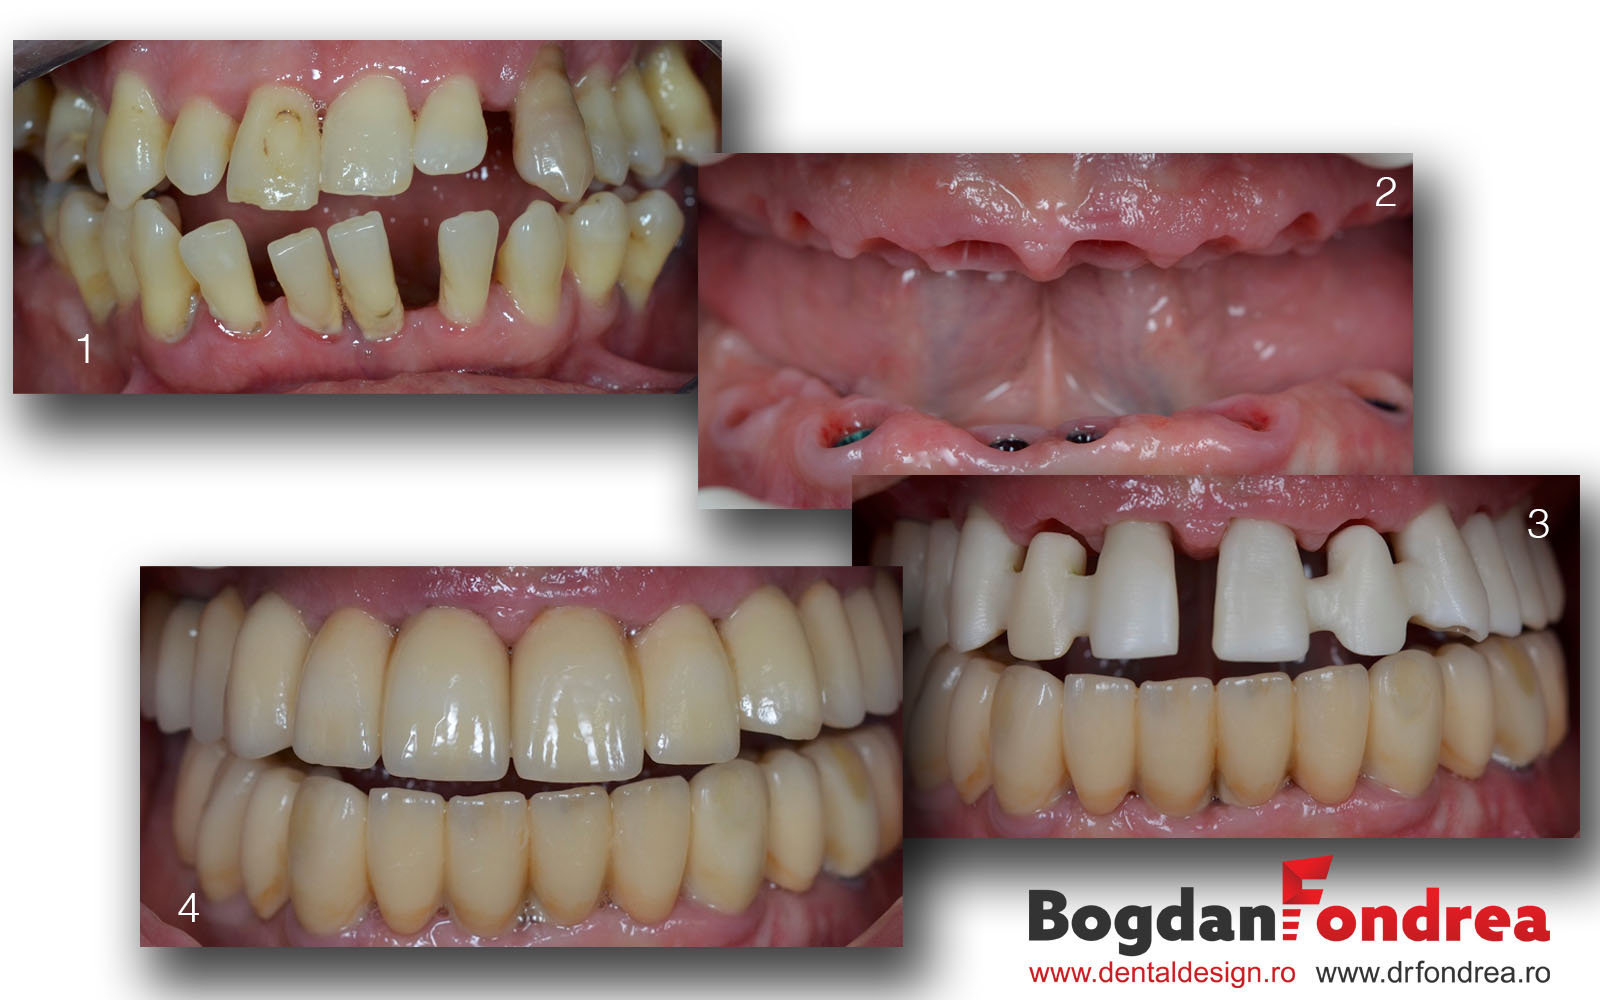 parodontoza gingie bogdan fondrea